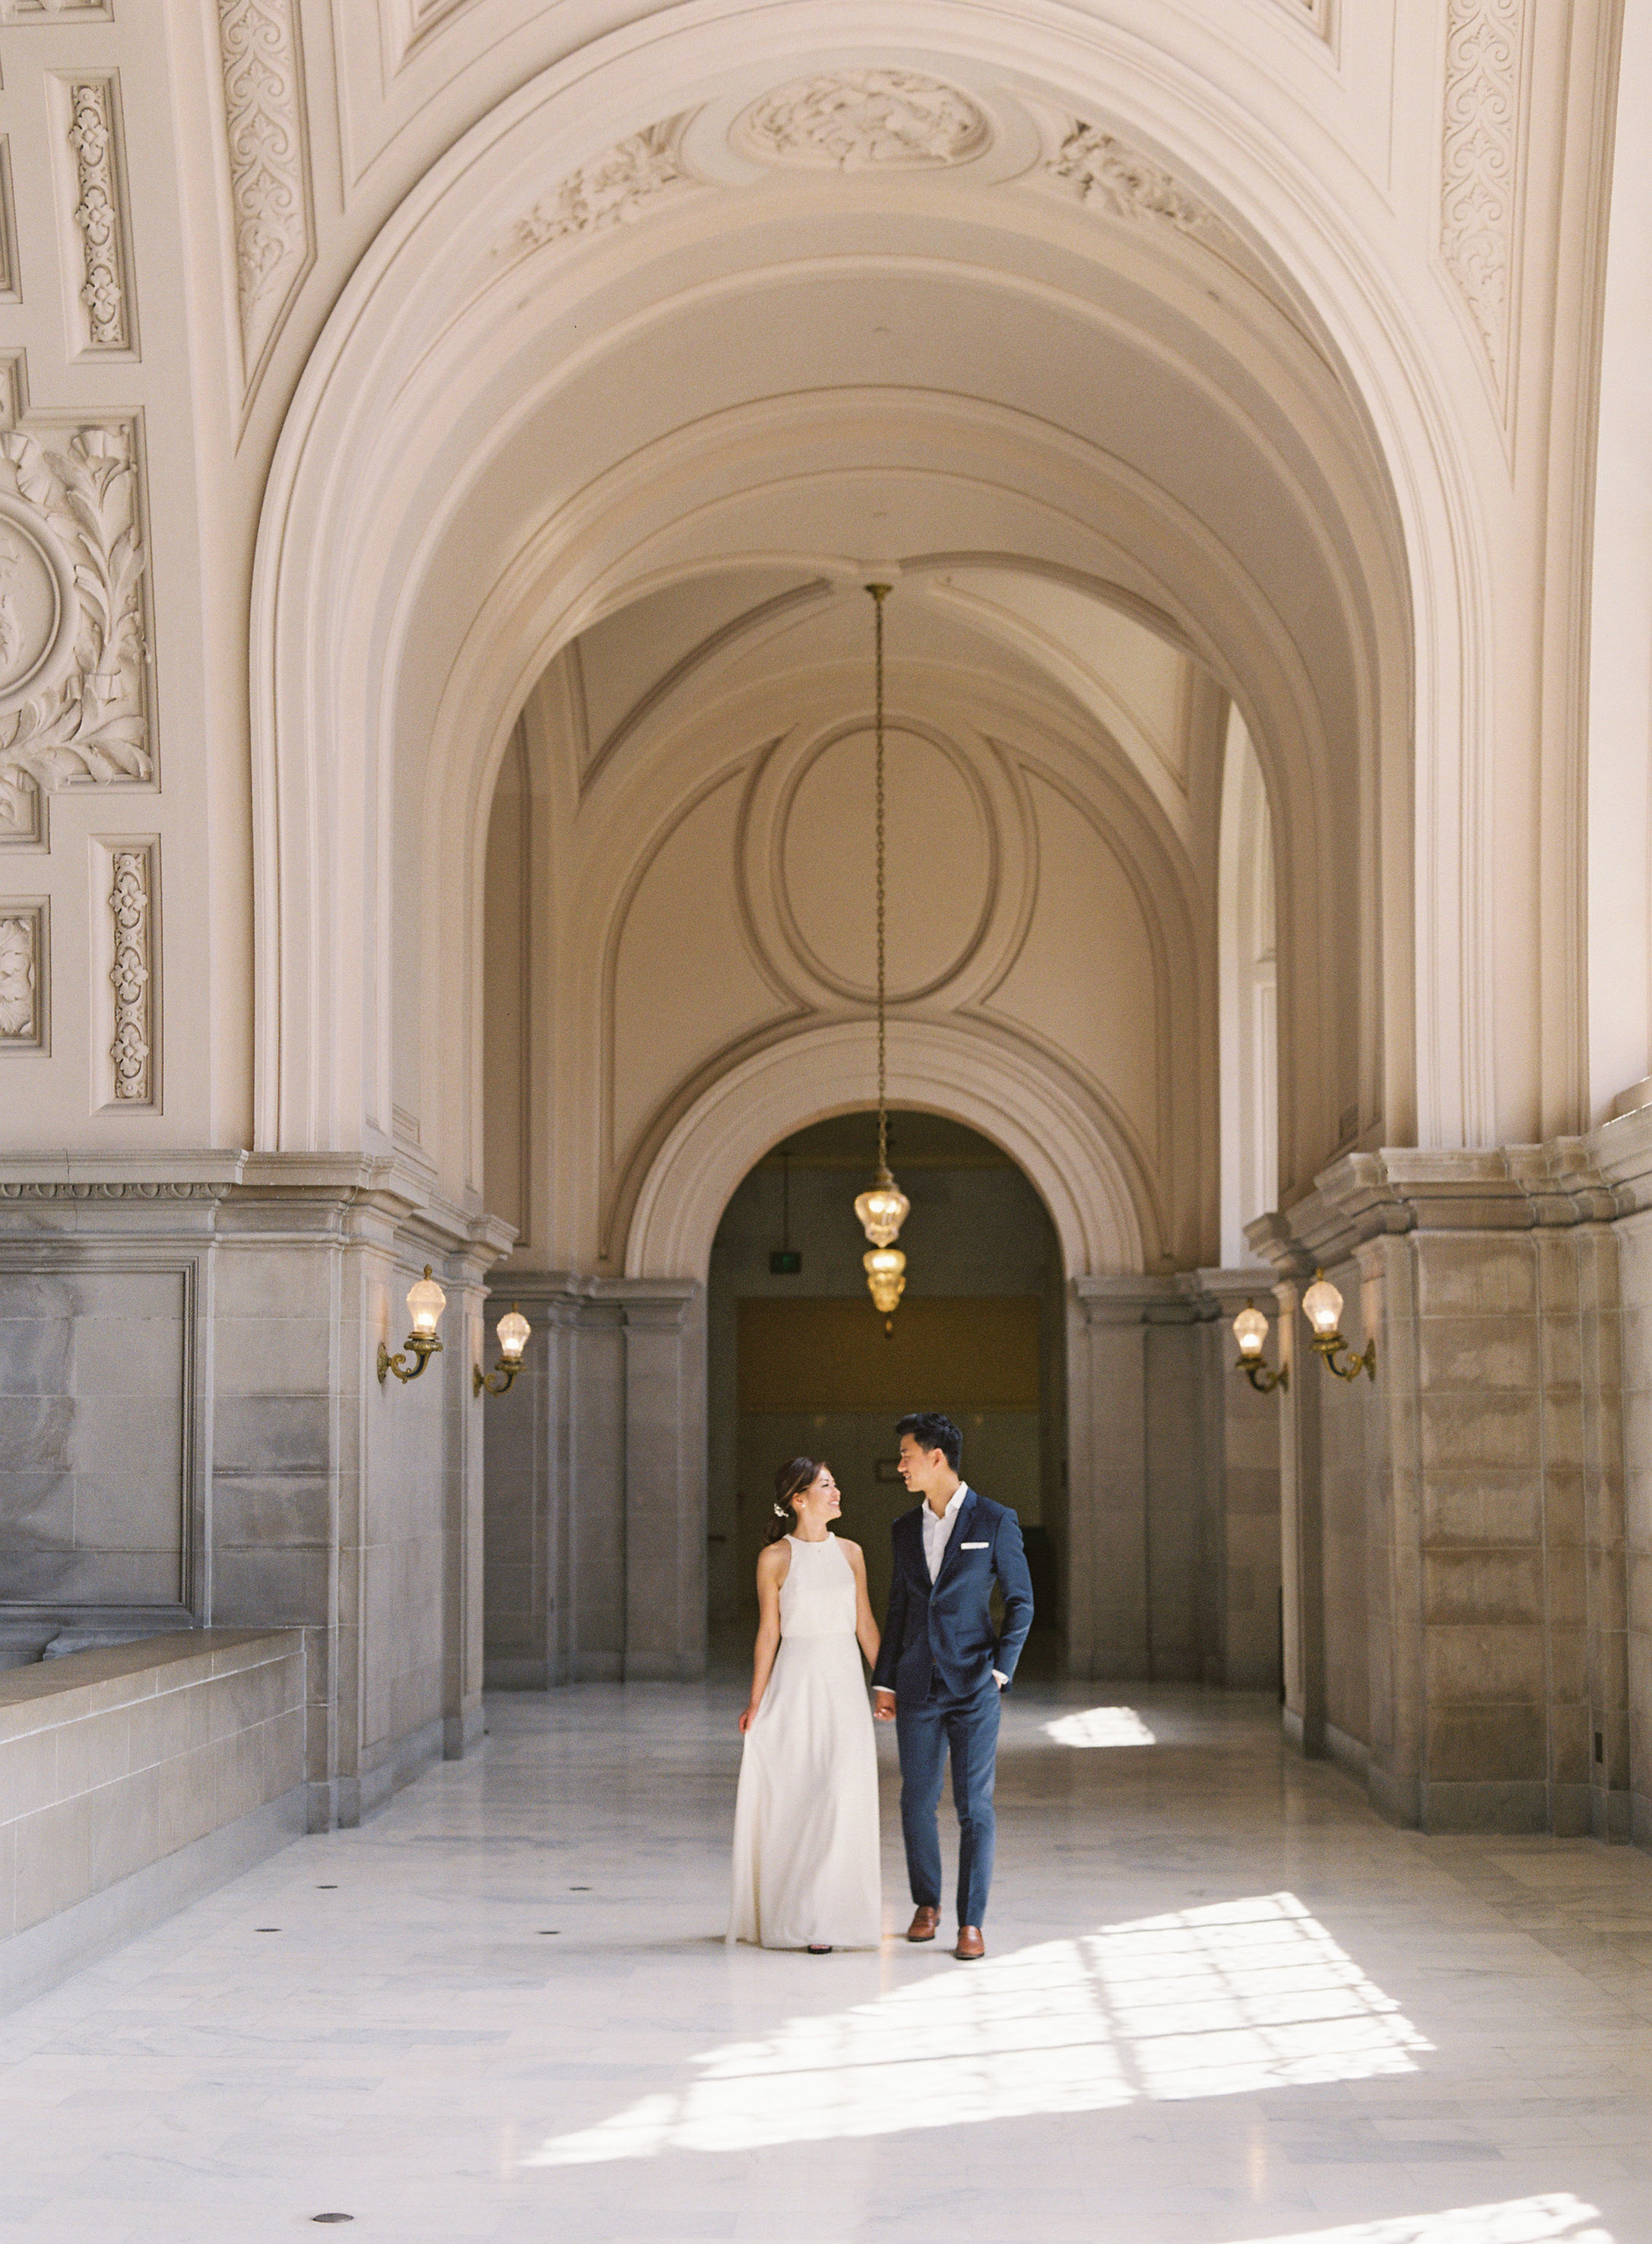 San-francisco-city-hall-photography-wedding-042.jpg